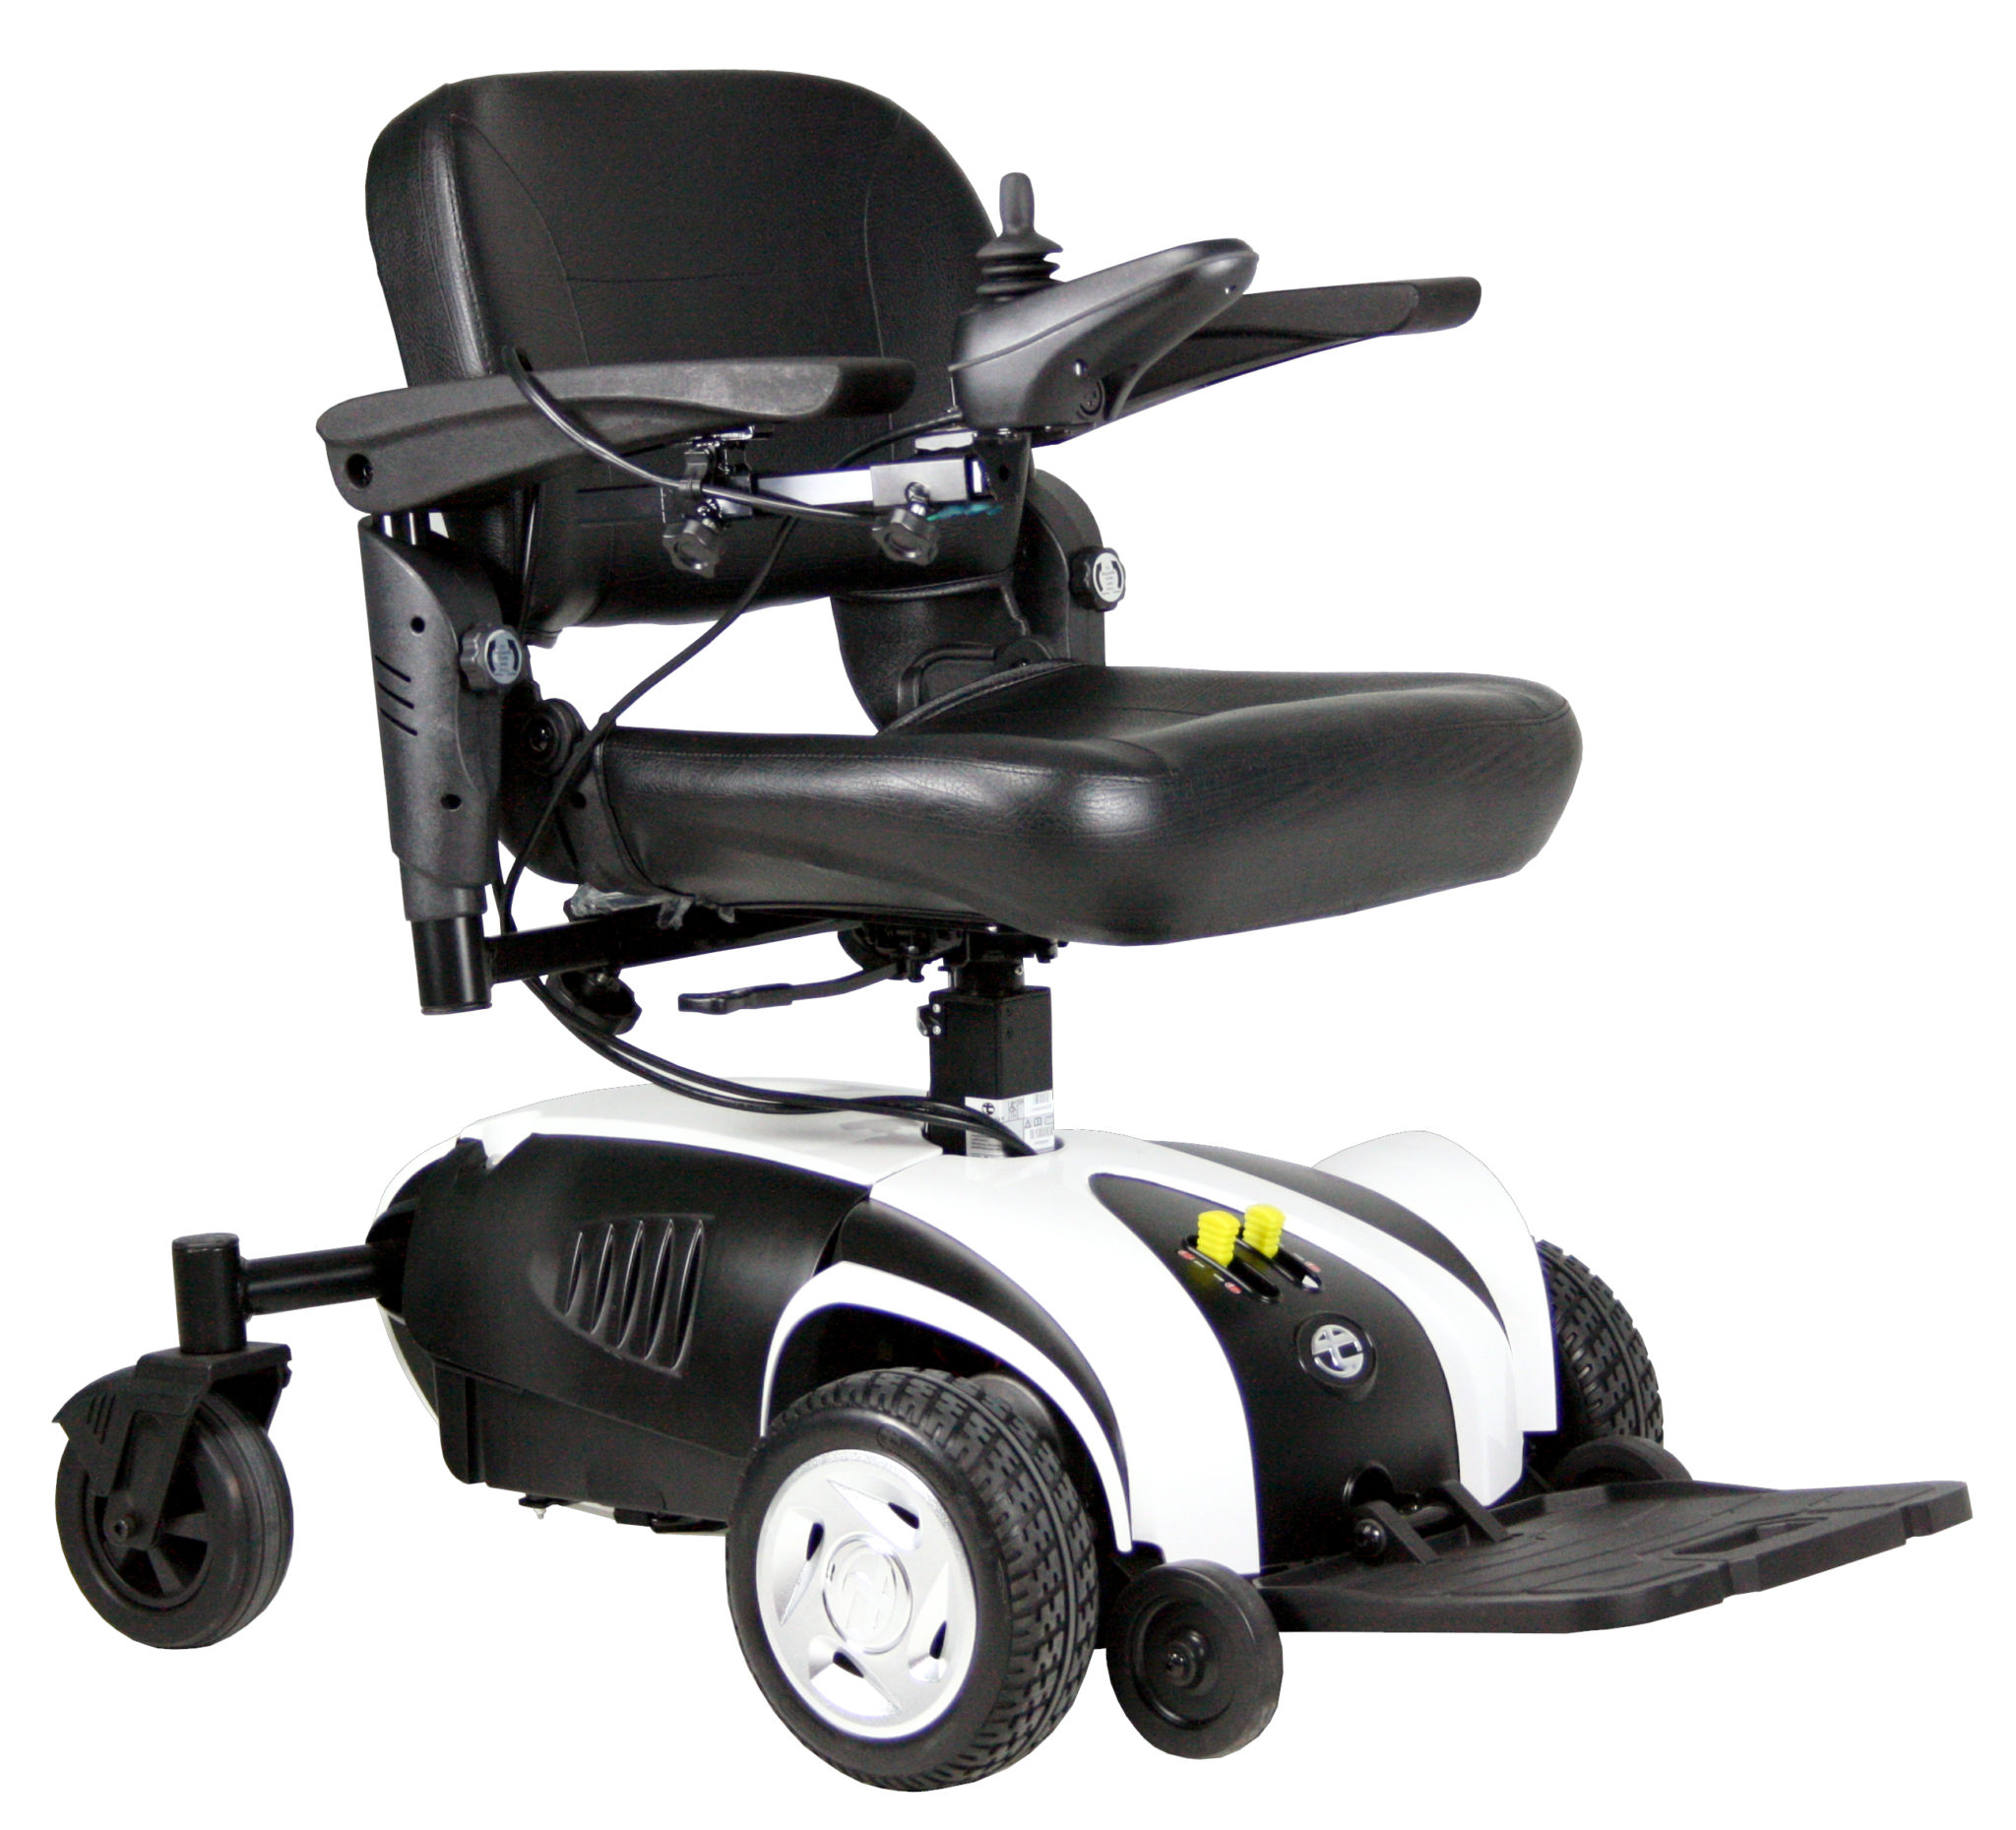 travelux-venture-seat-lowered.jpg